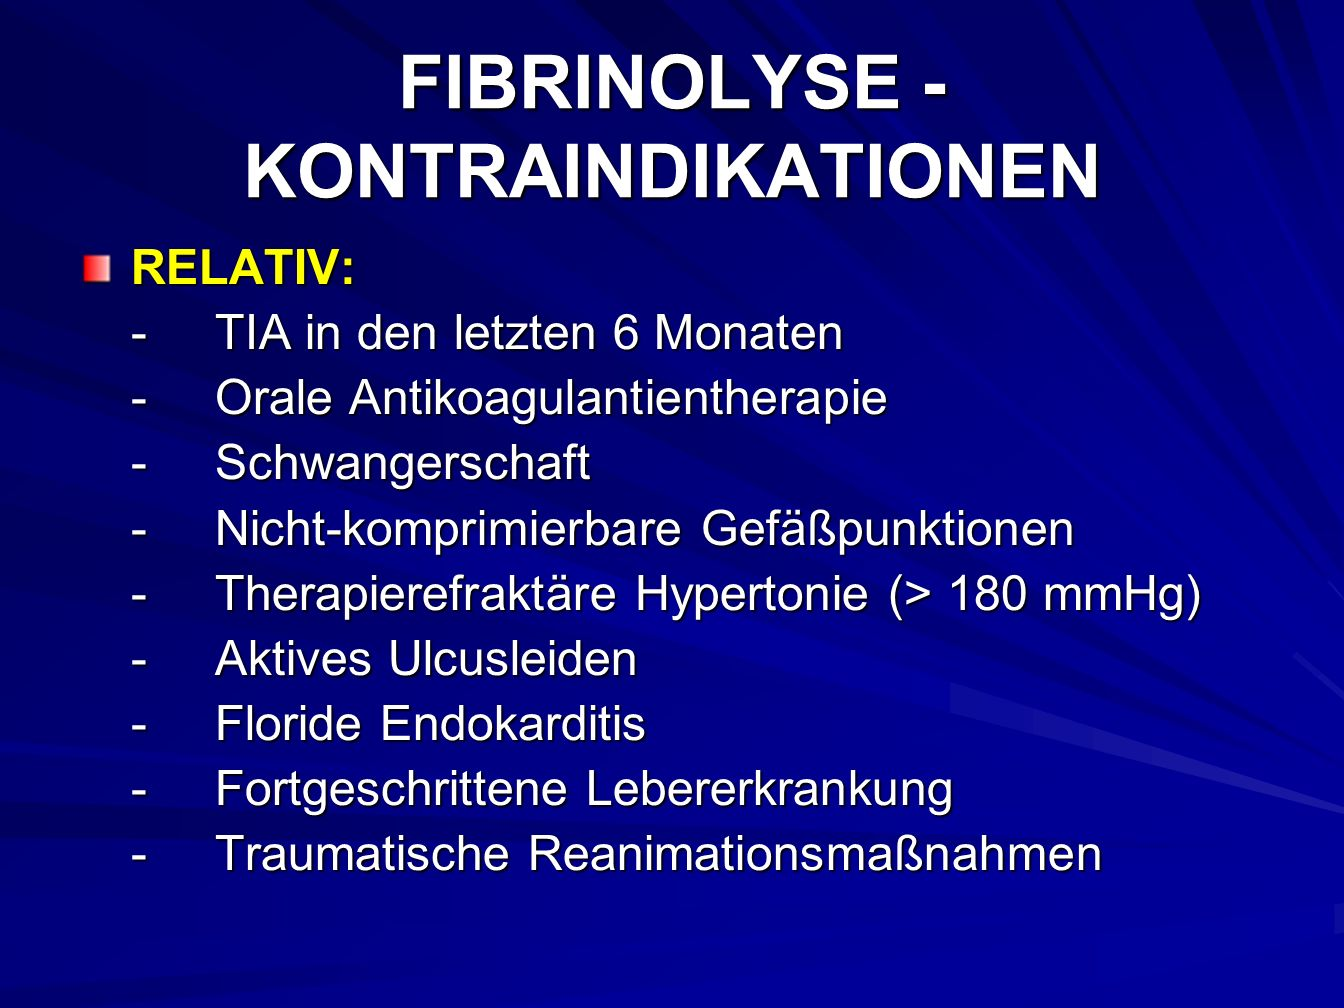 FIBRINOLYSE - KONTRAINDIKATIONEN